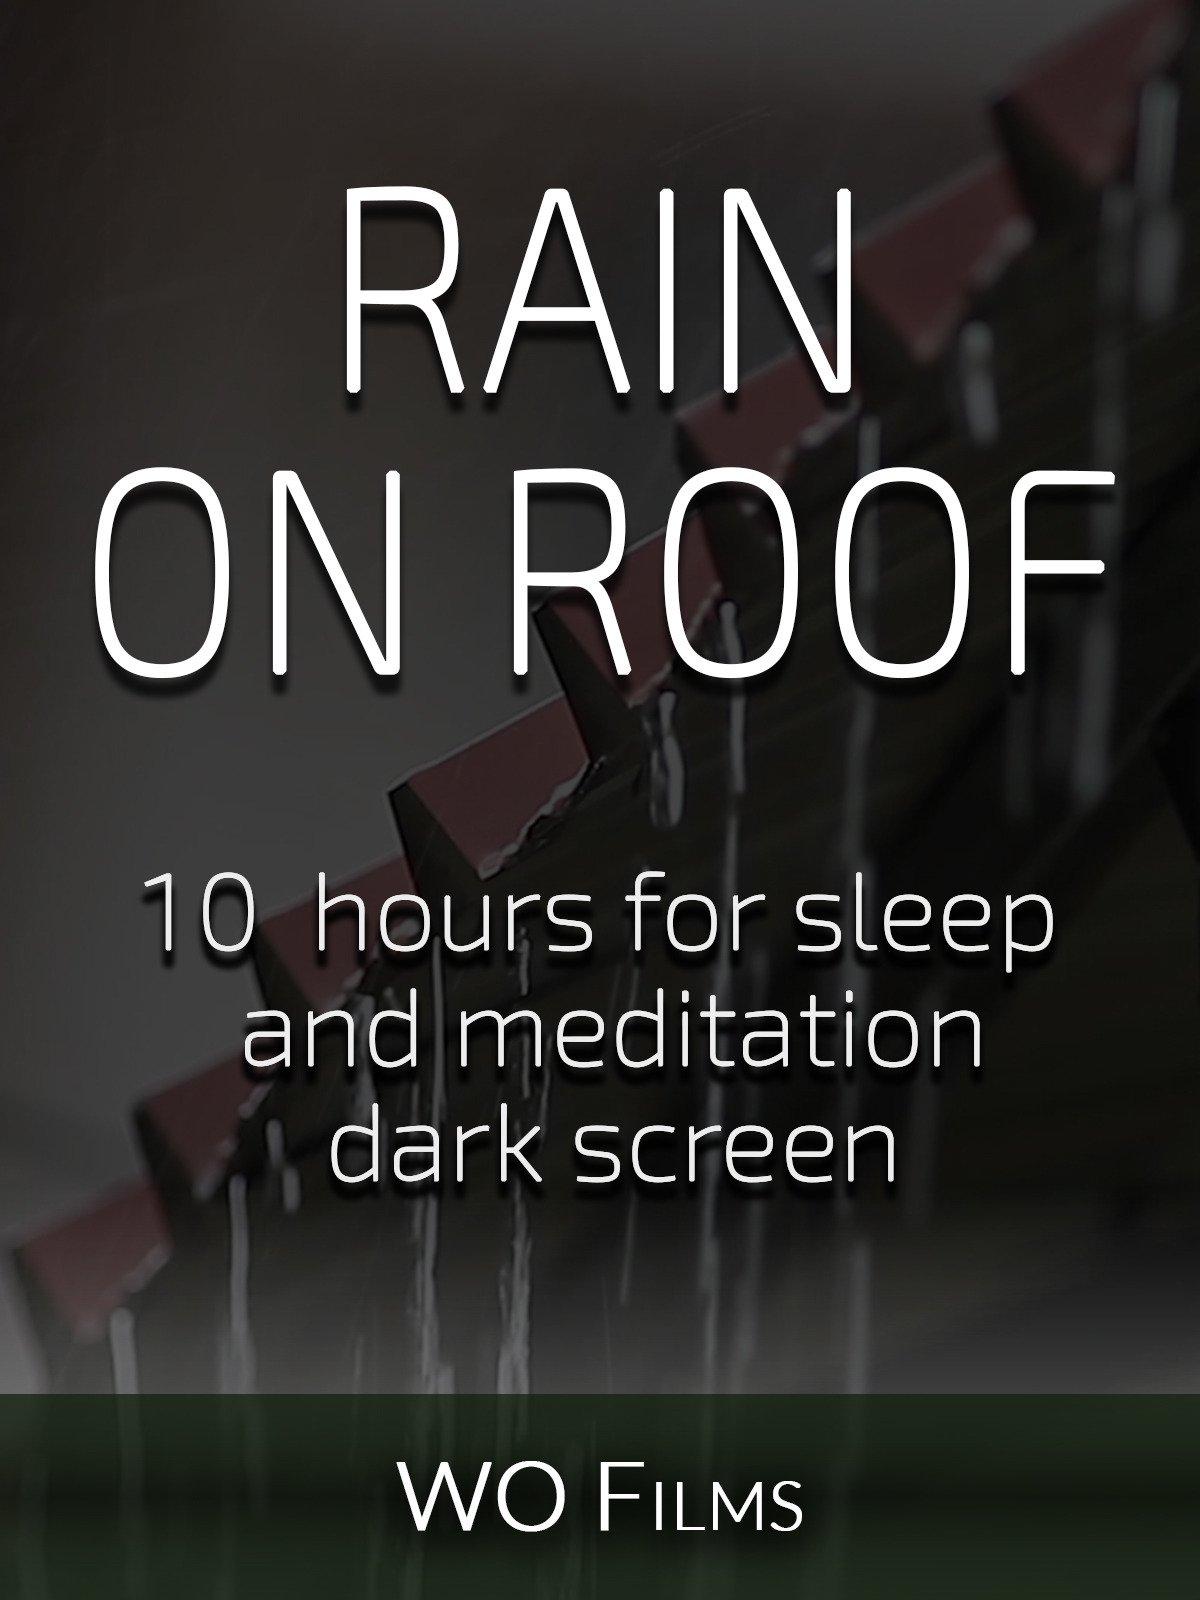 Rain on roof, 10 hours for Sleep and Meditation, dark screen